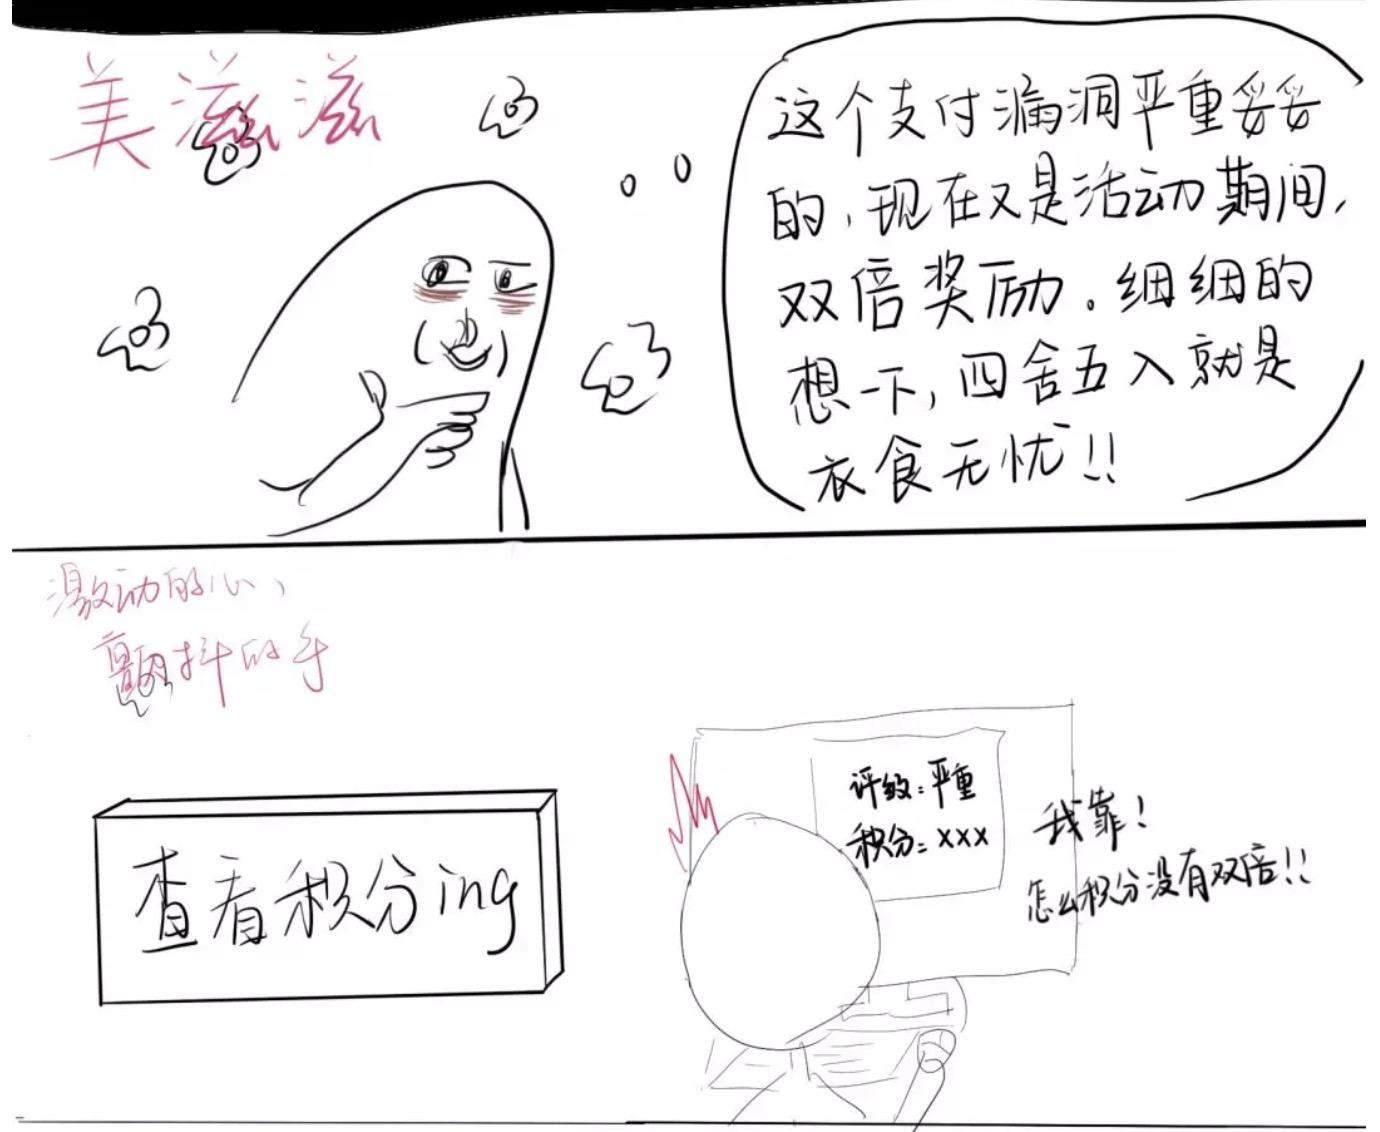 https://momo-mmsrc.oss-cn-hangzhou.aliyuncs.com/img-1ce2f79a-e88c-3cb1-bb2a-cda2cbab6475.jpeg